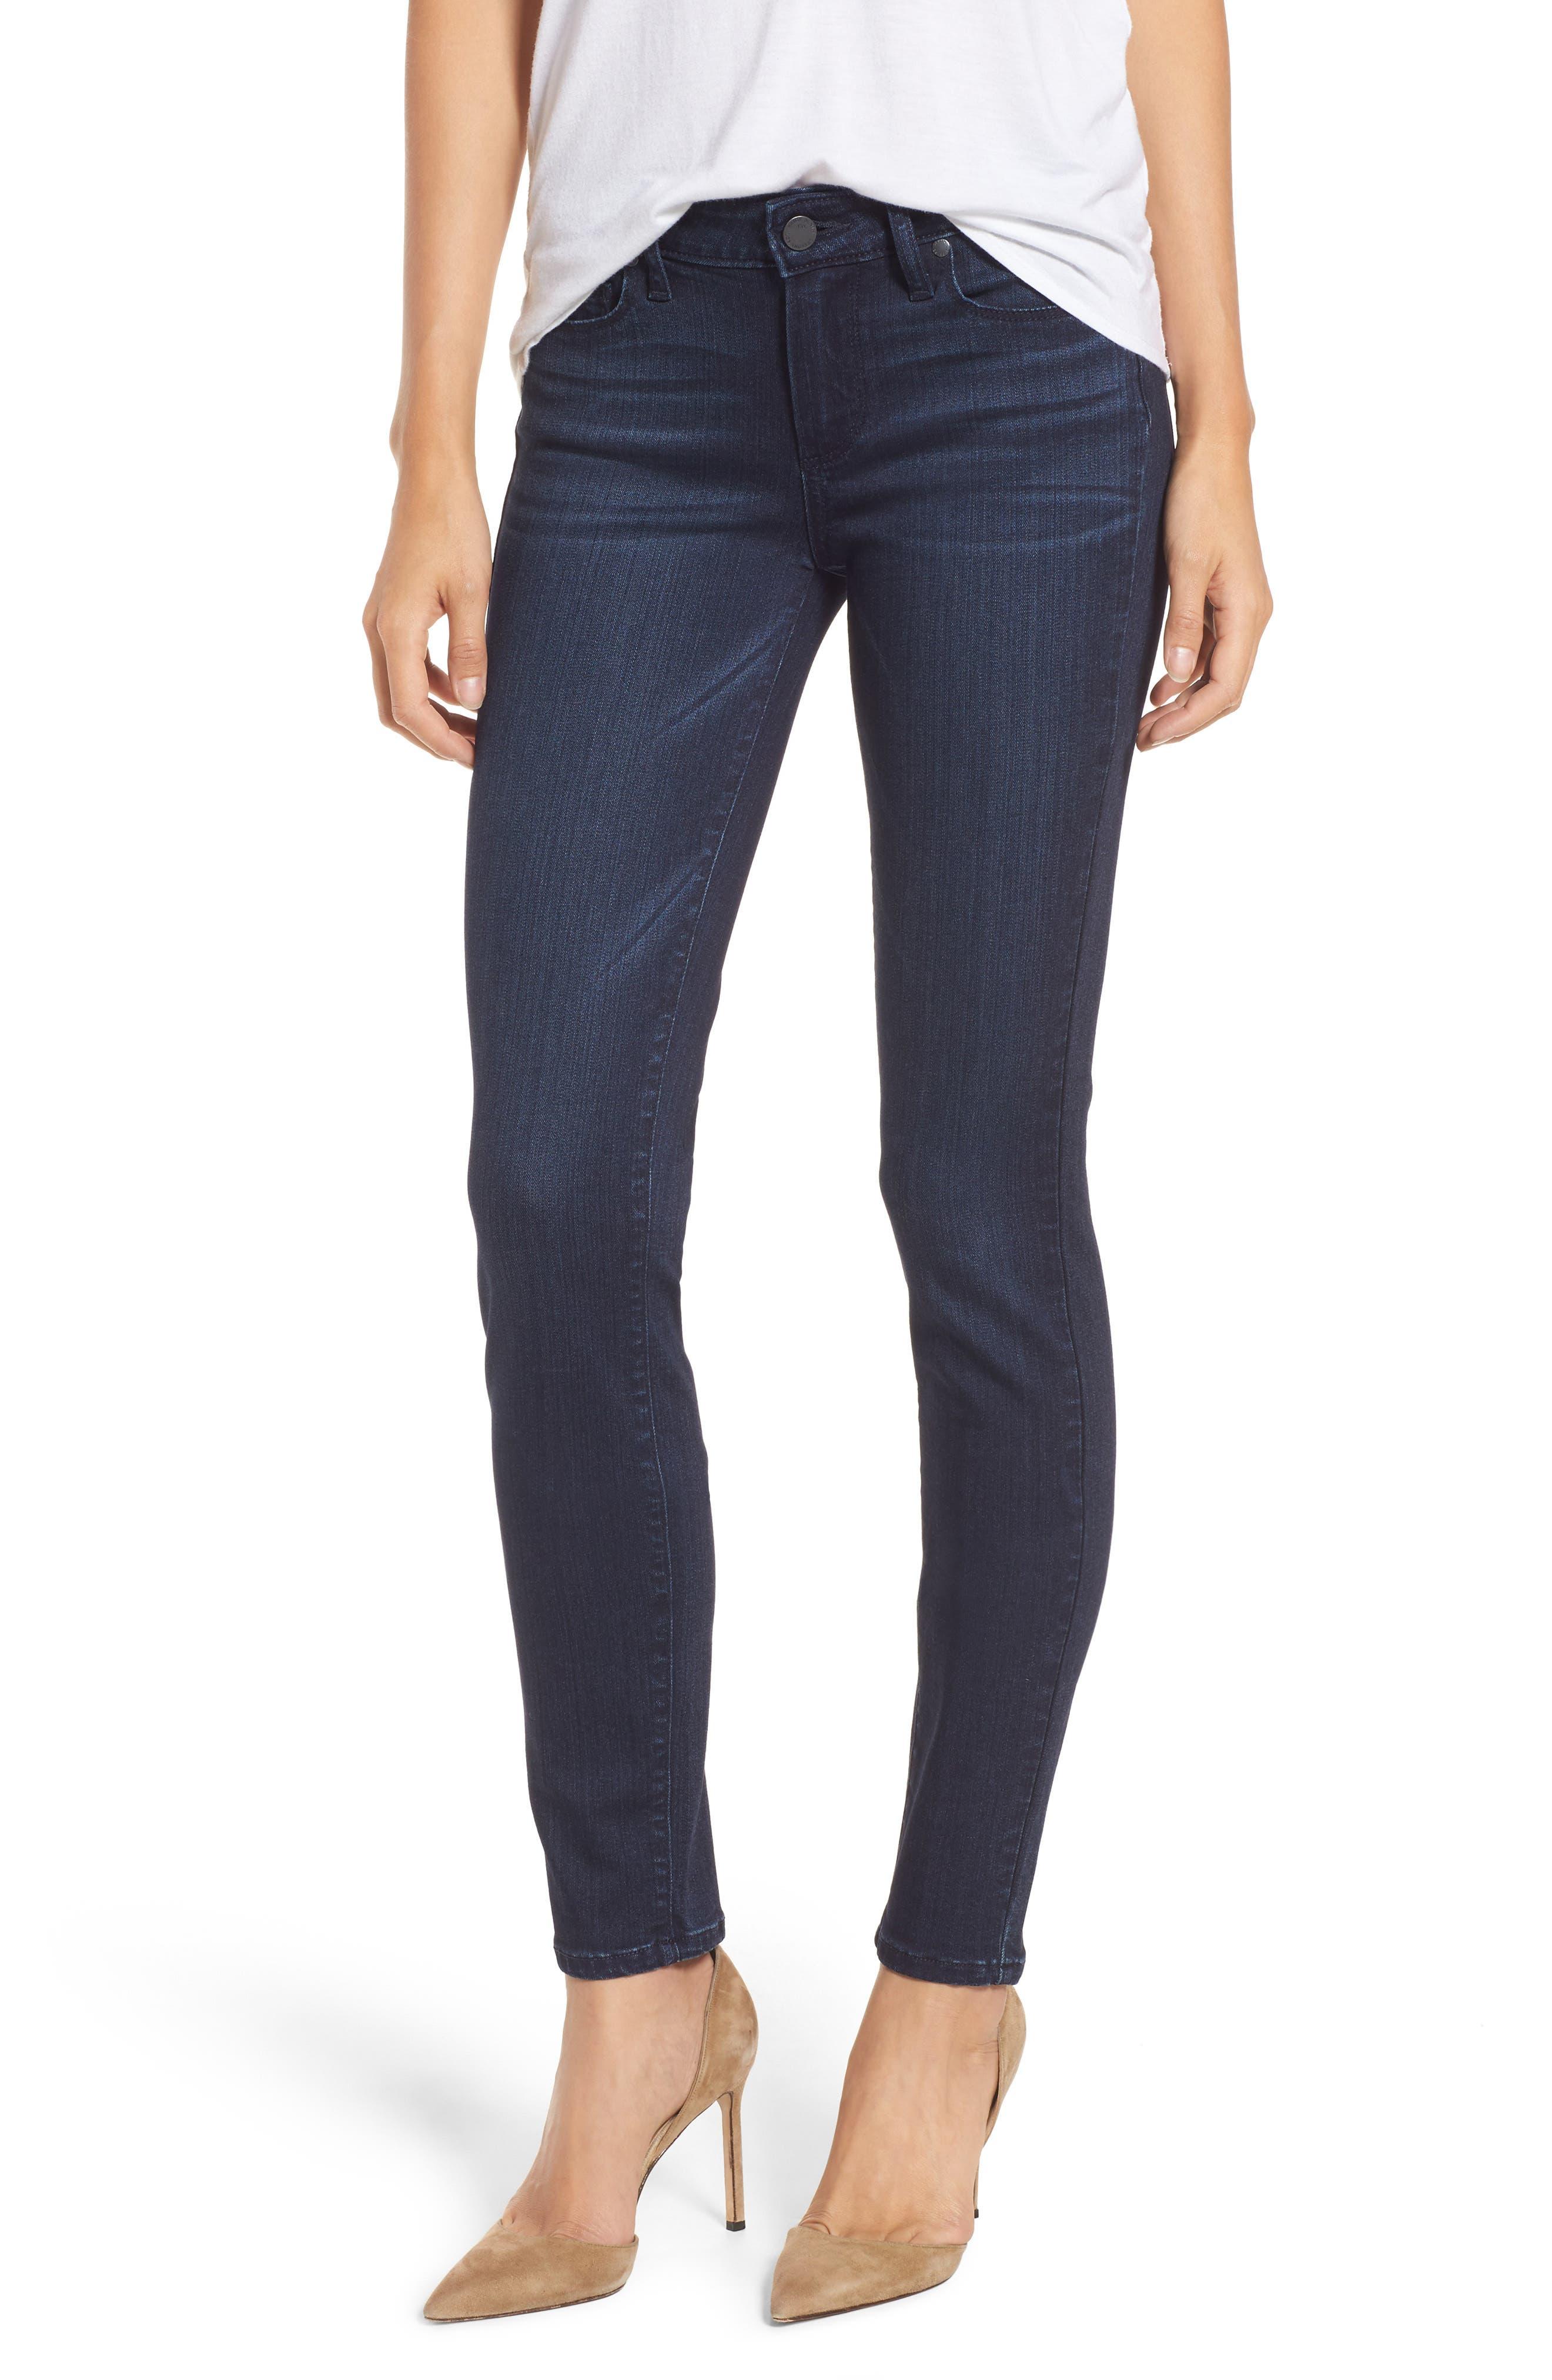 Alternate Image 1 Selected - PAIGE Transcend - Verdugo Ultra Skinny Jeans (Hazen)